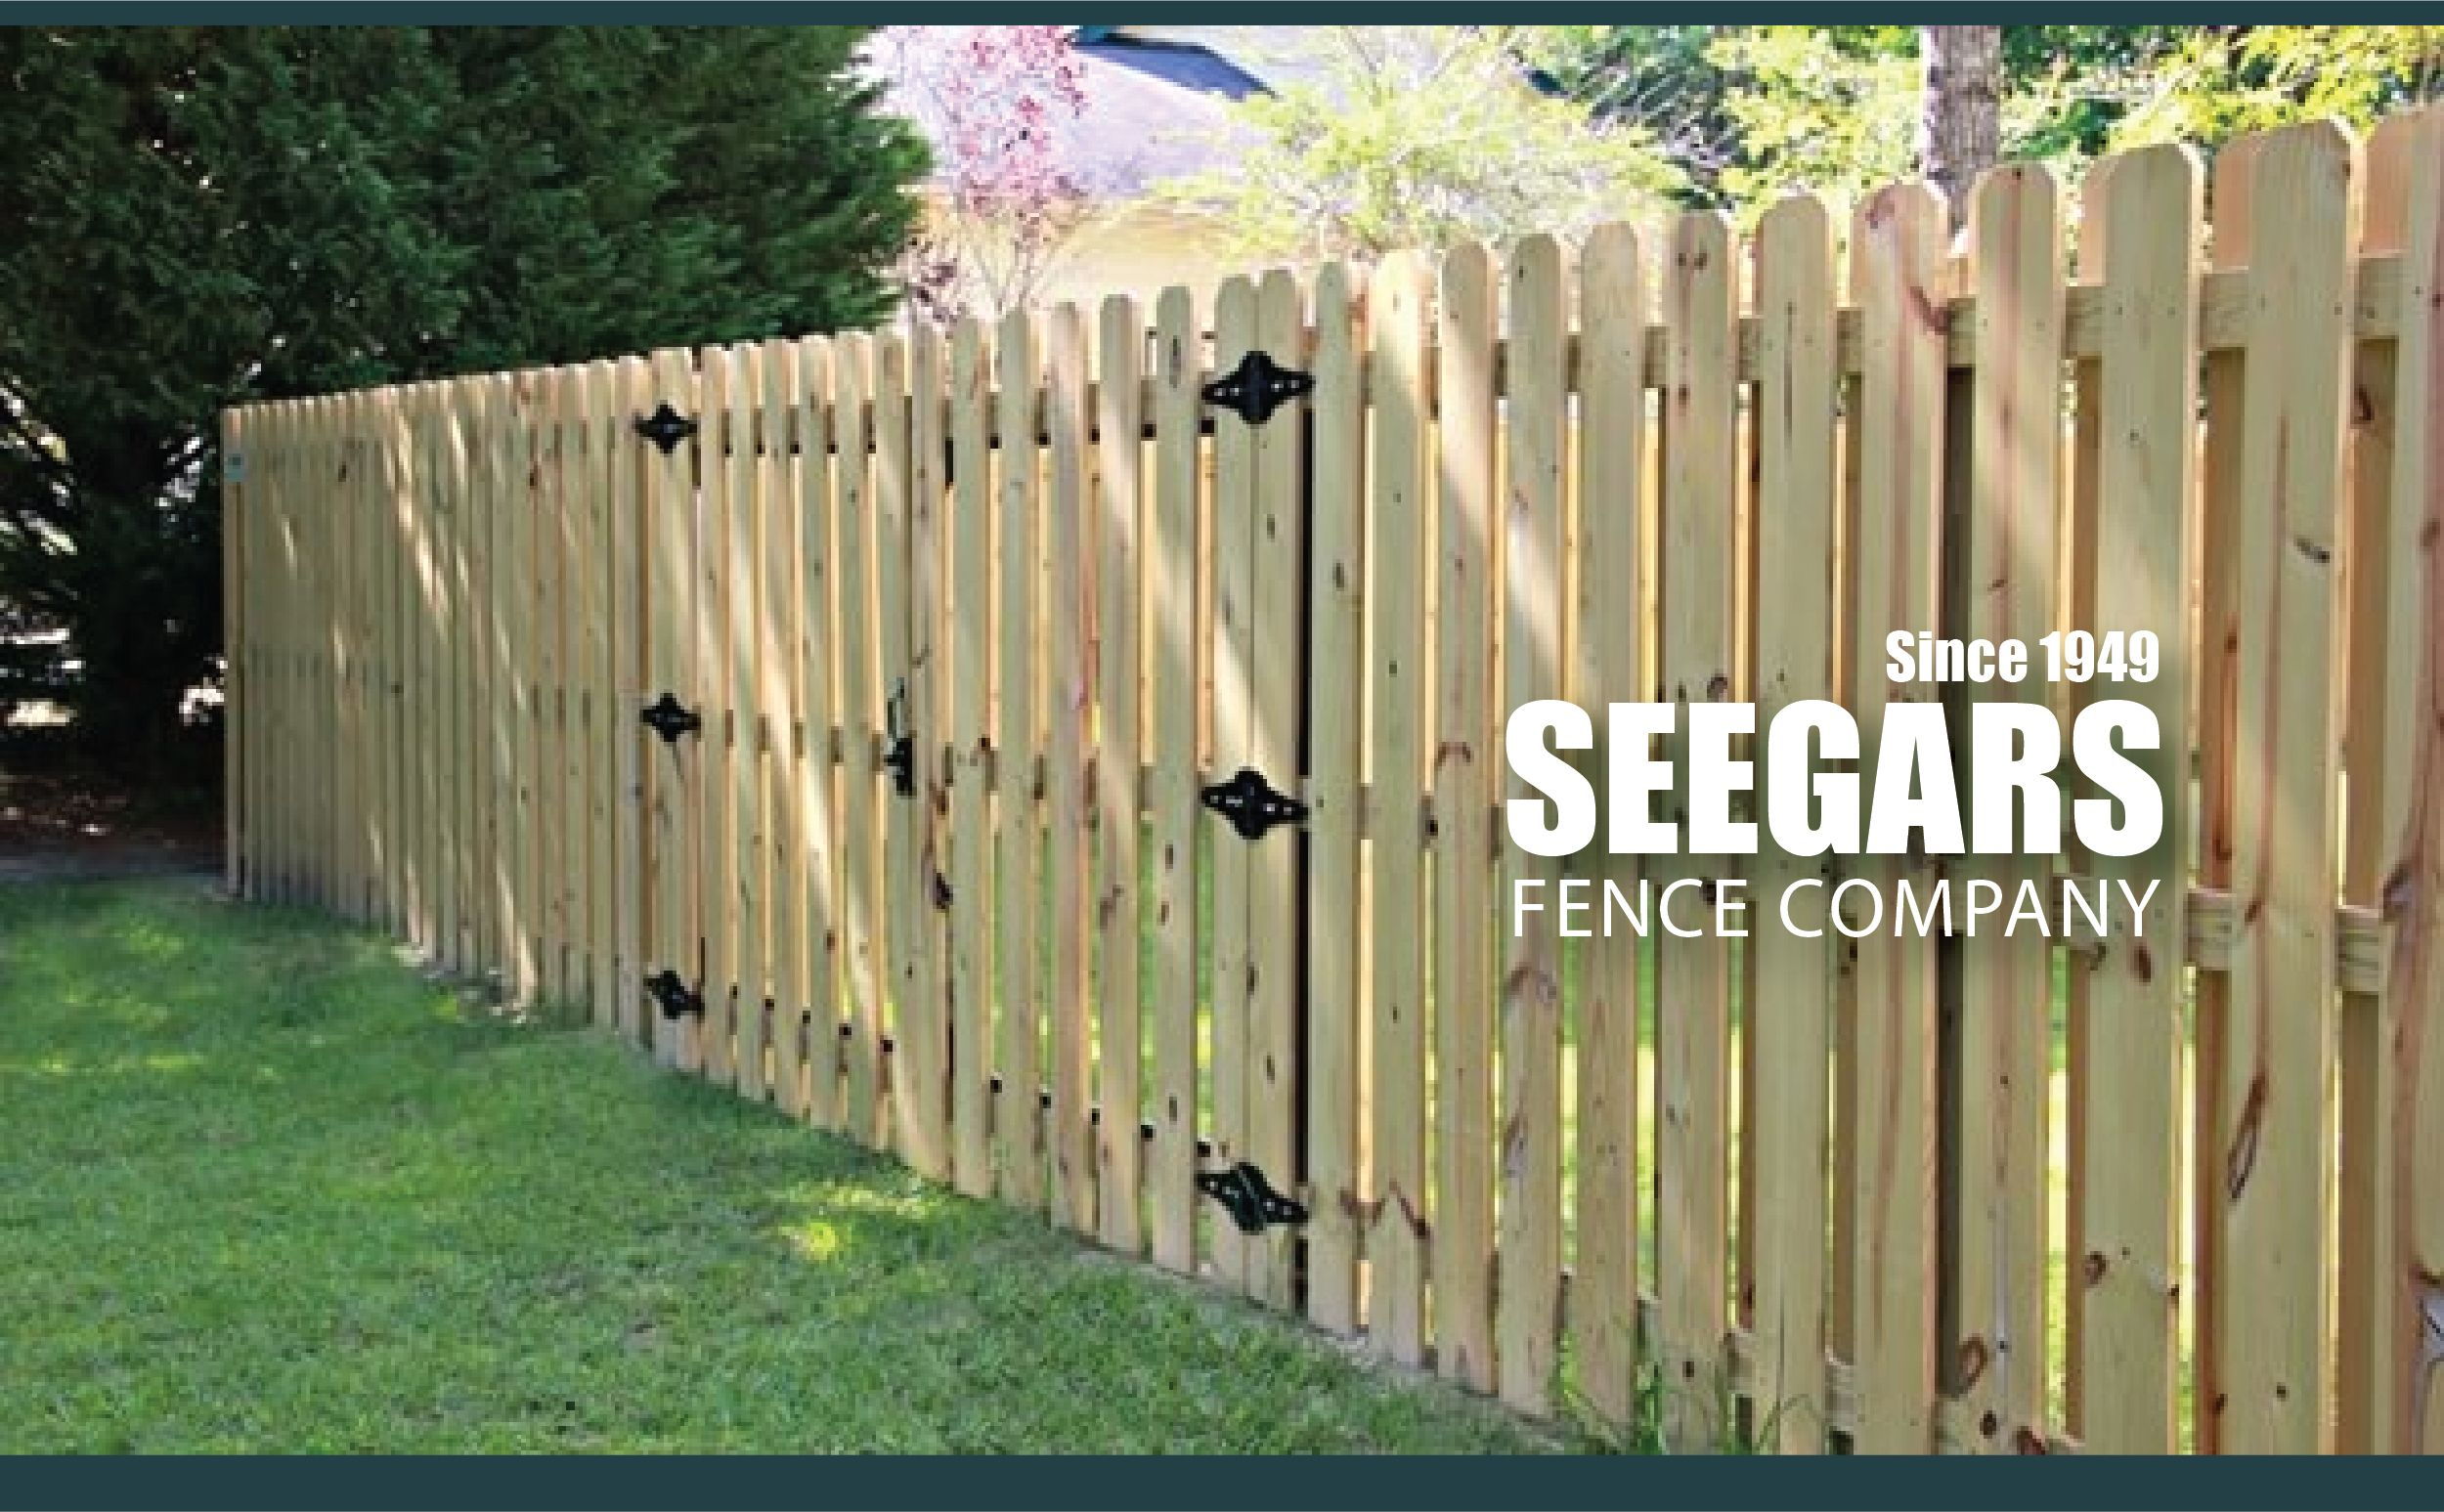 Pin On Seegars Fence Company